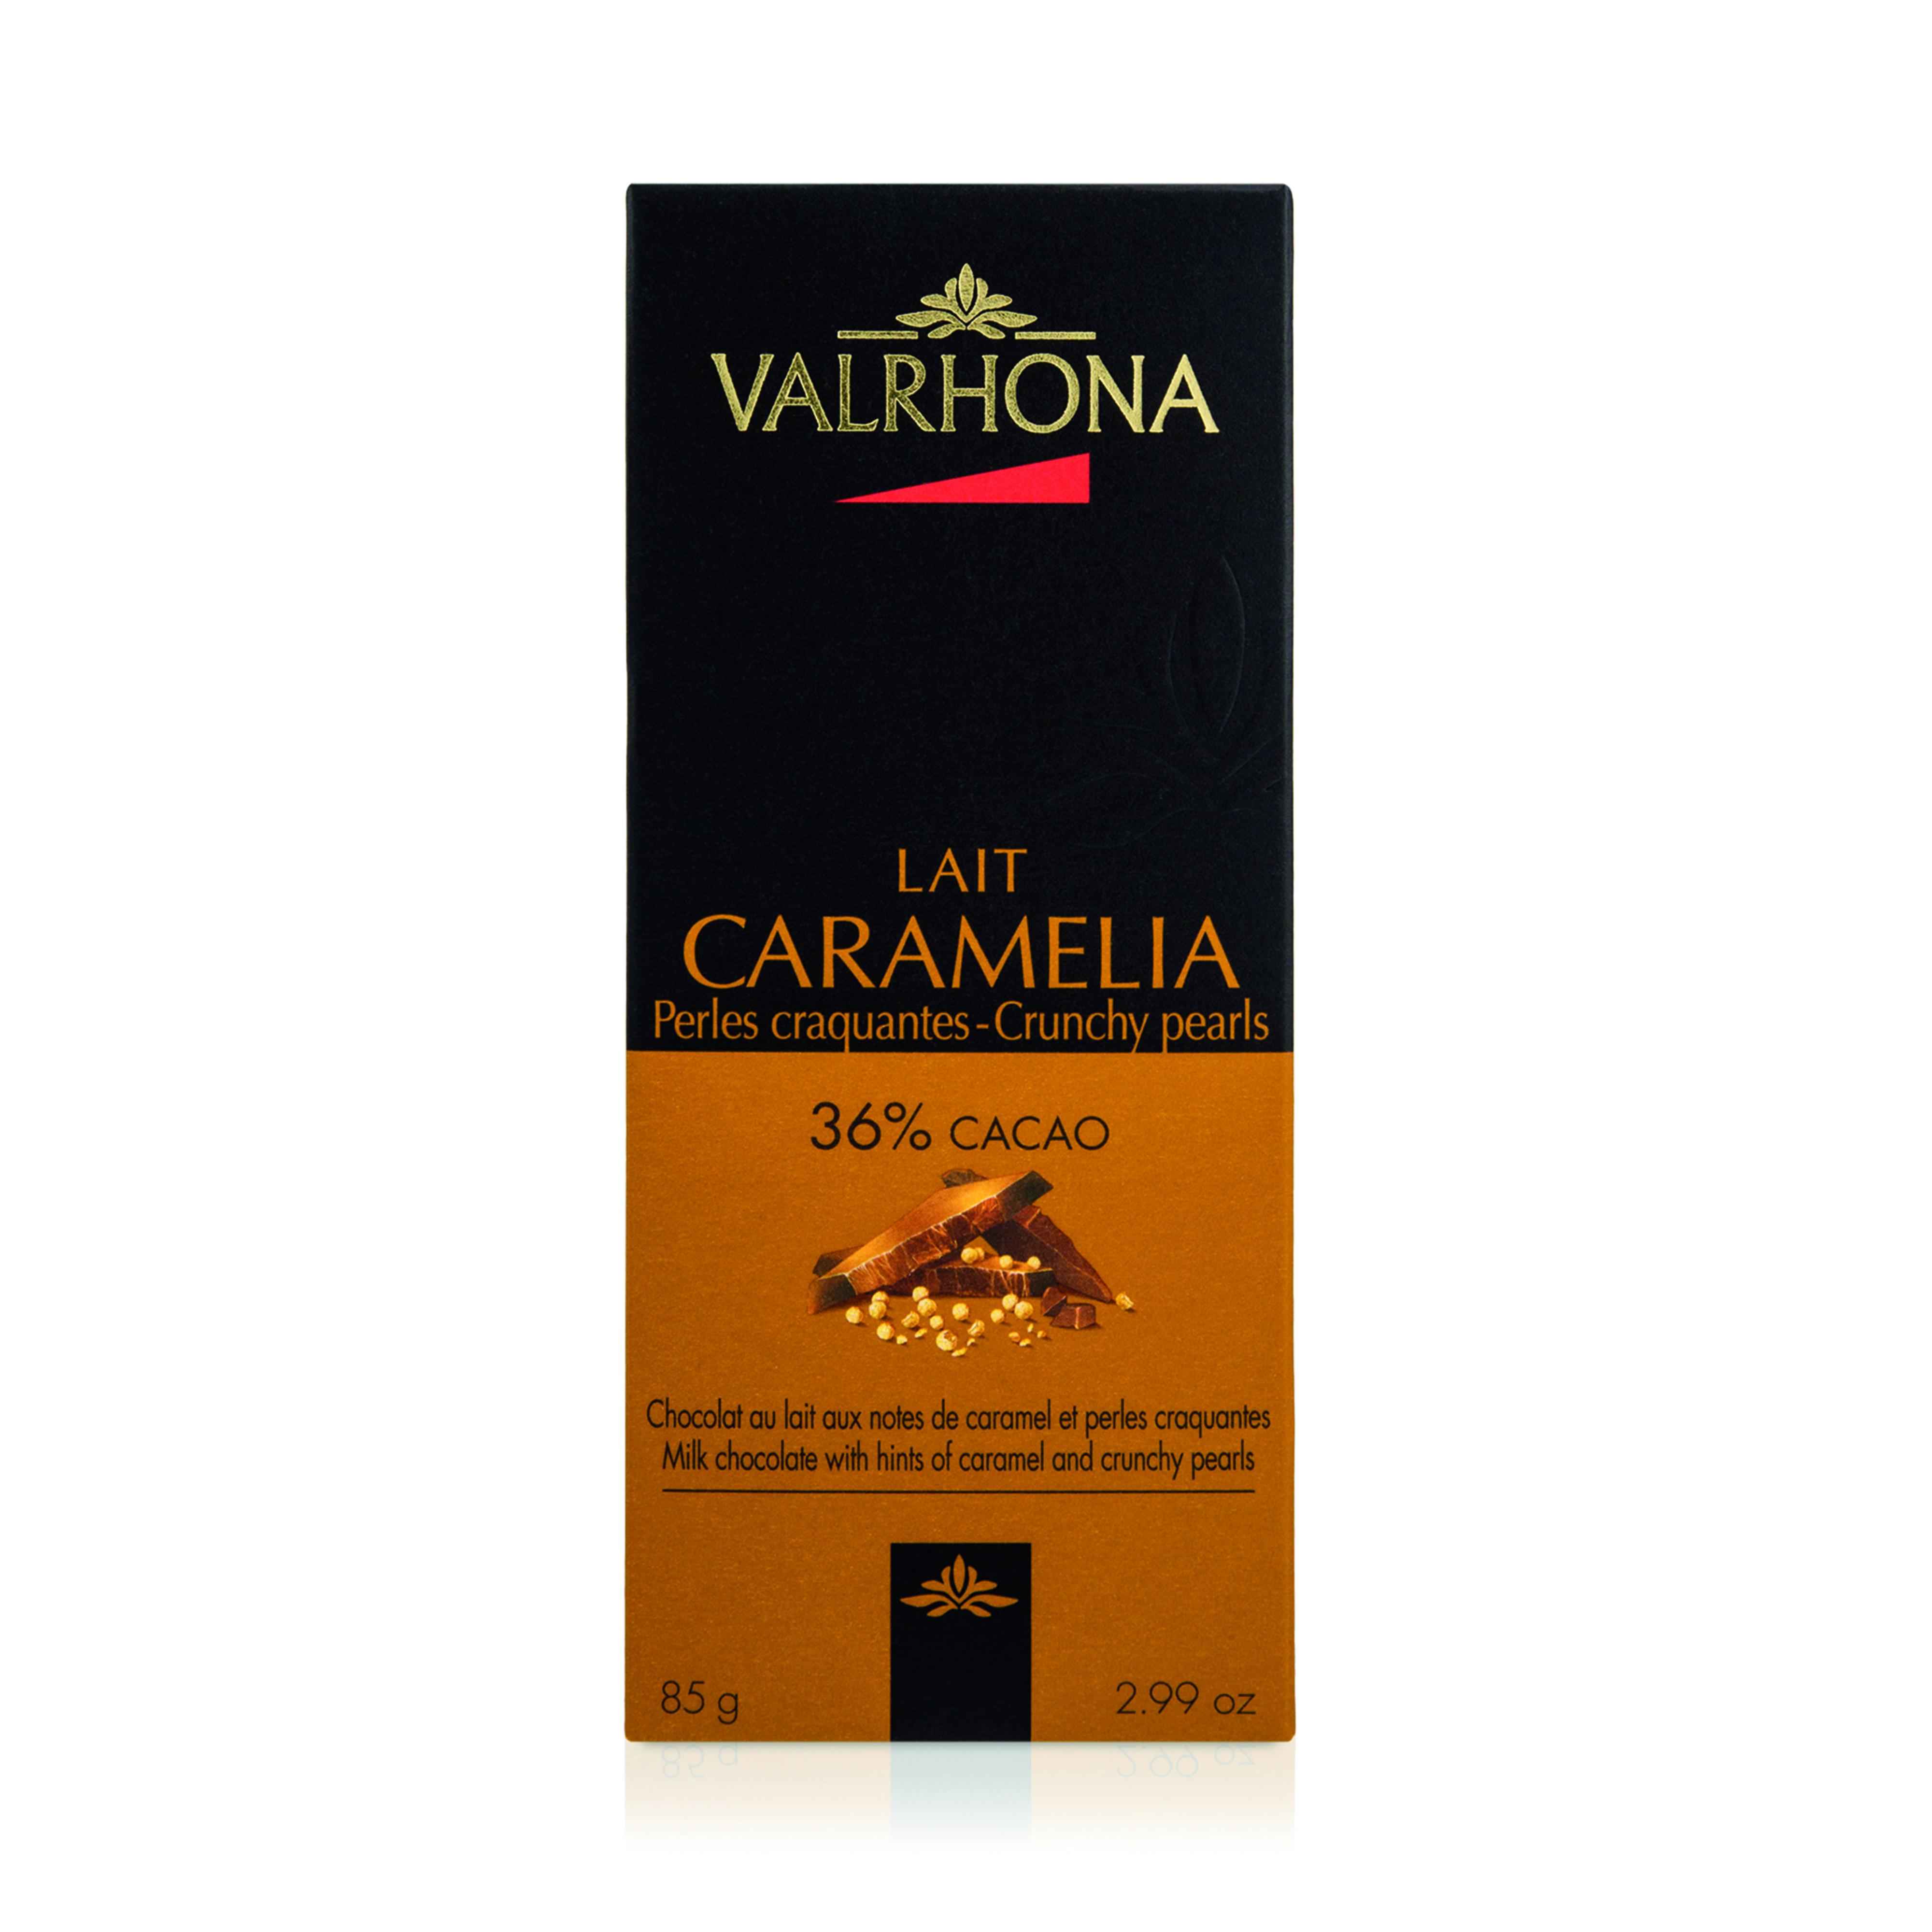 TABLETTE CARAMELIA 36% PERLE CRAQUANTE - Assemblage de Grands Crus